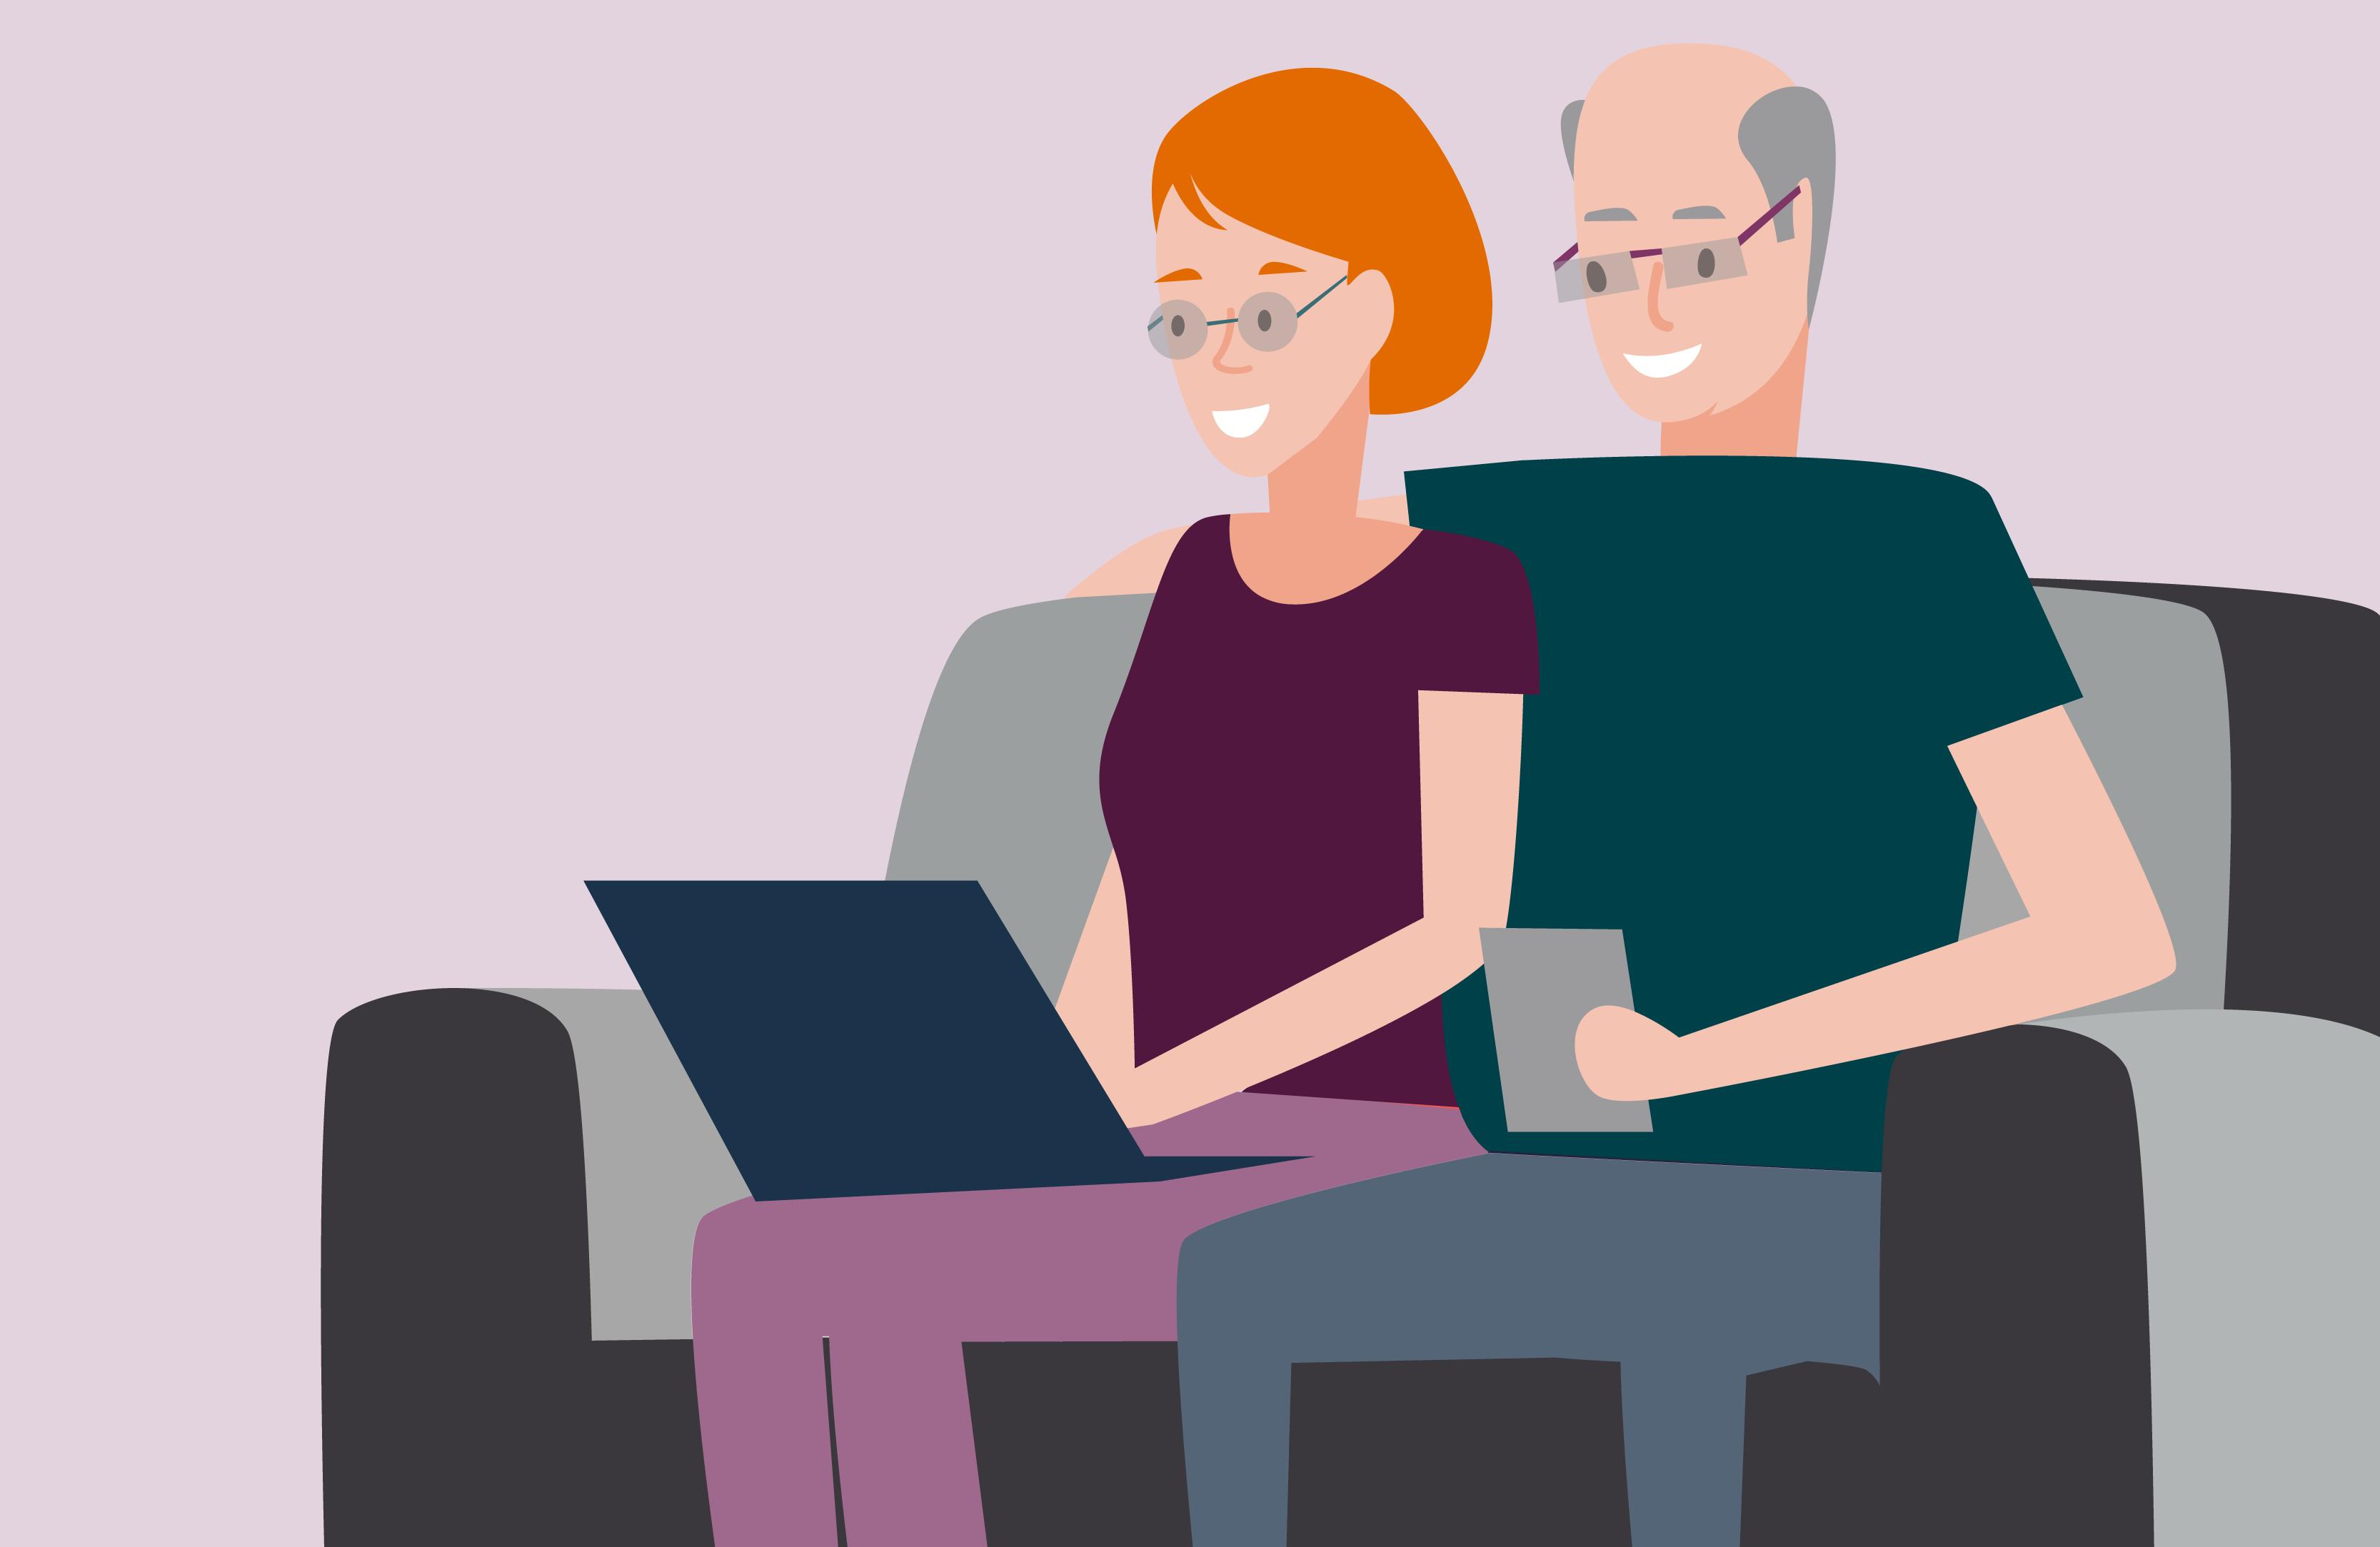 Media Inside Out: Digital Literacy for the Elderly